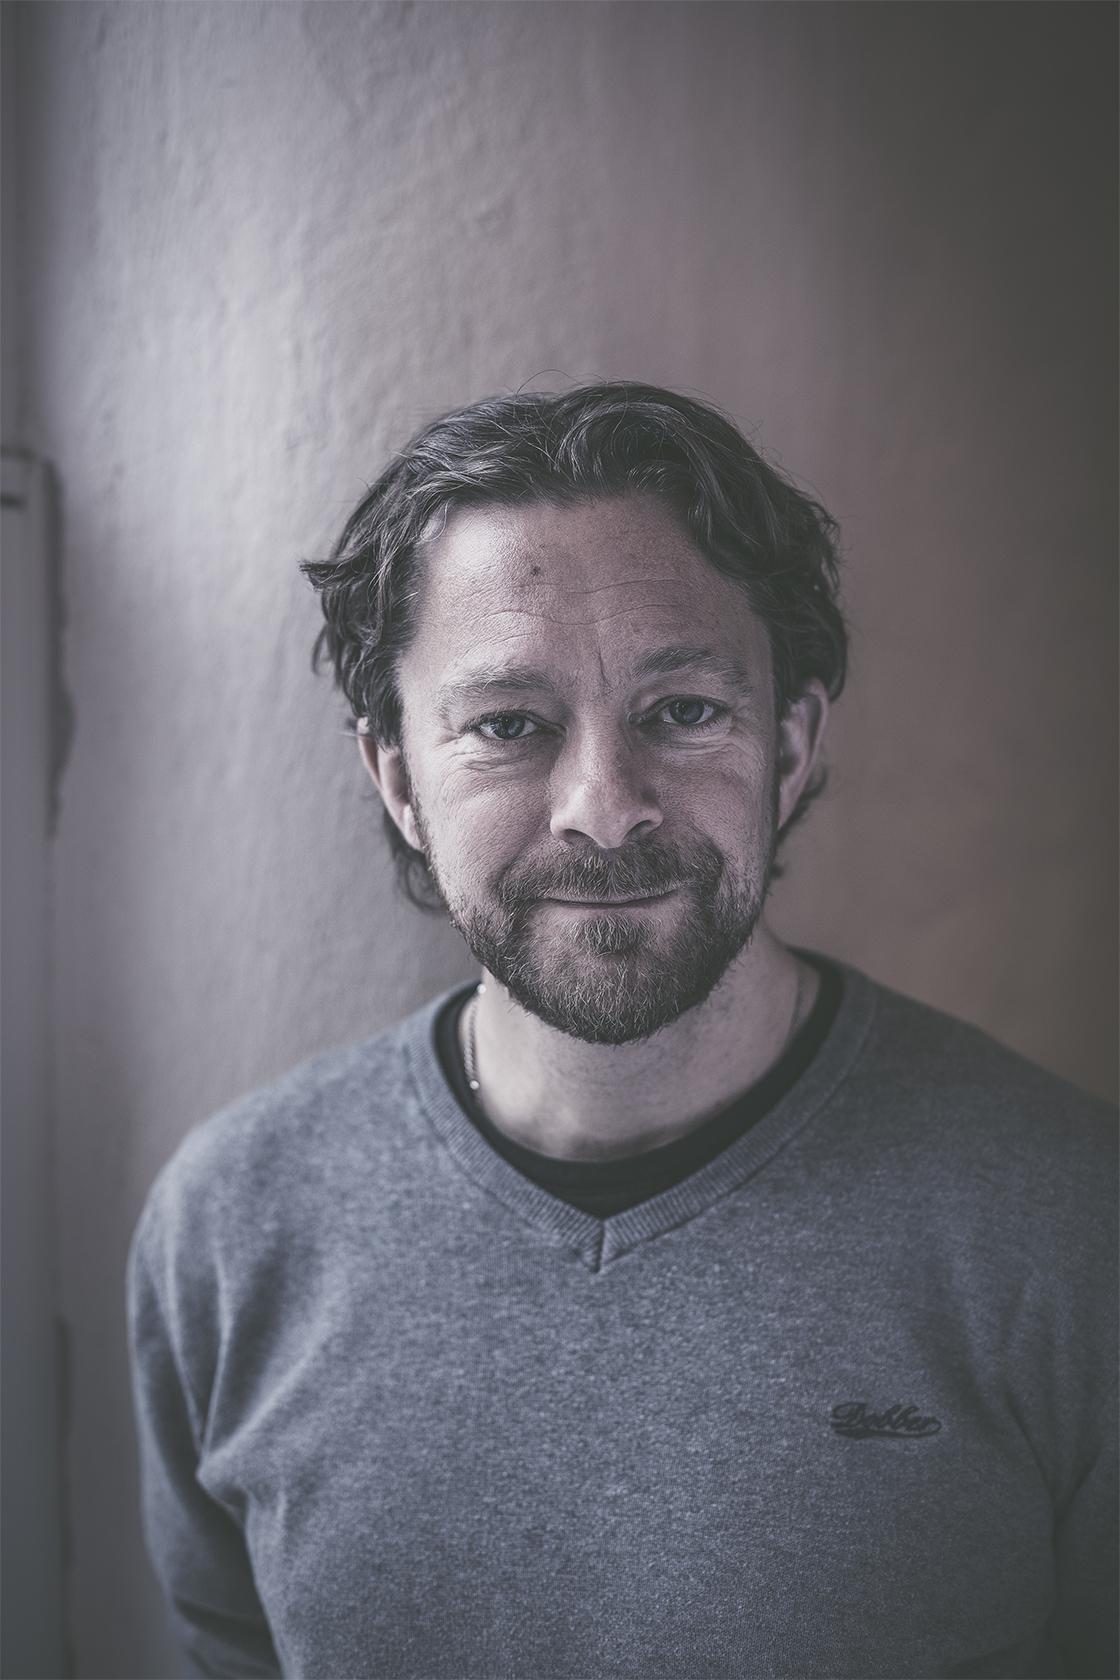 Micke Jonsson